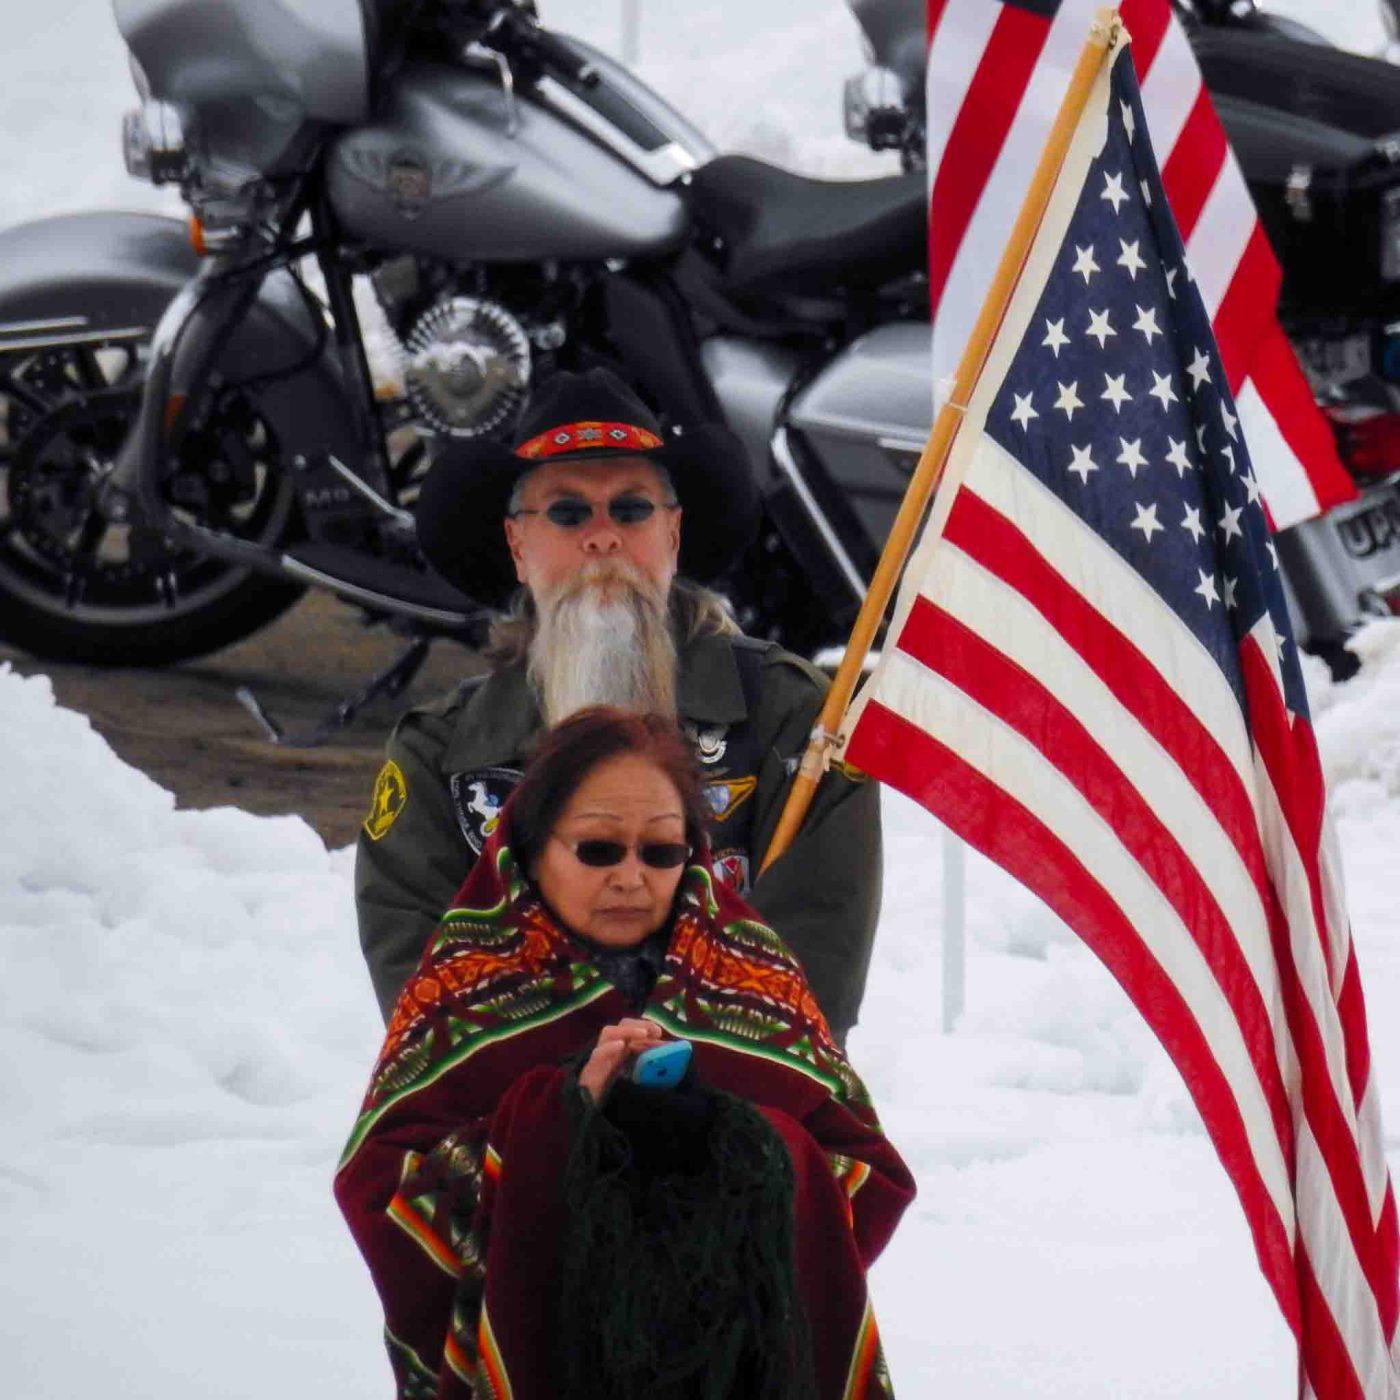 Trent Nelson | The Salt Lake Tribune Onlookers at the graveside service for Officer Douglas Scott Barney, at the Orem Cemetery, Monday January 25, 2016.